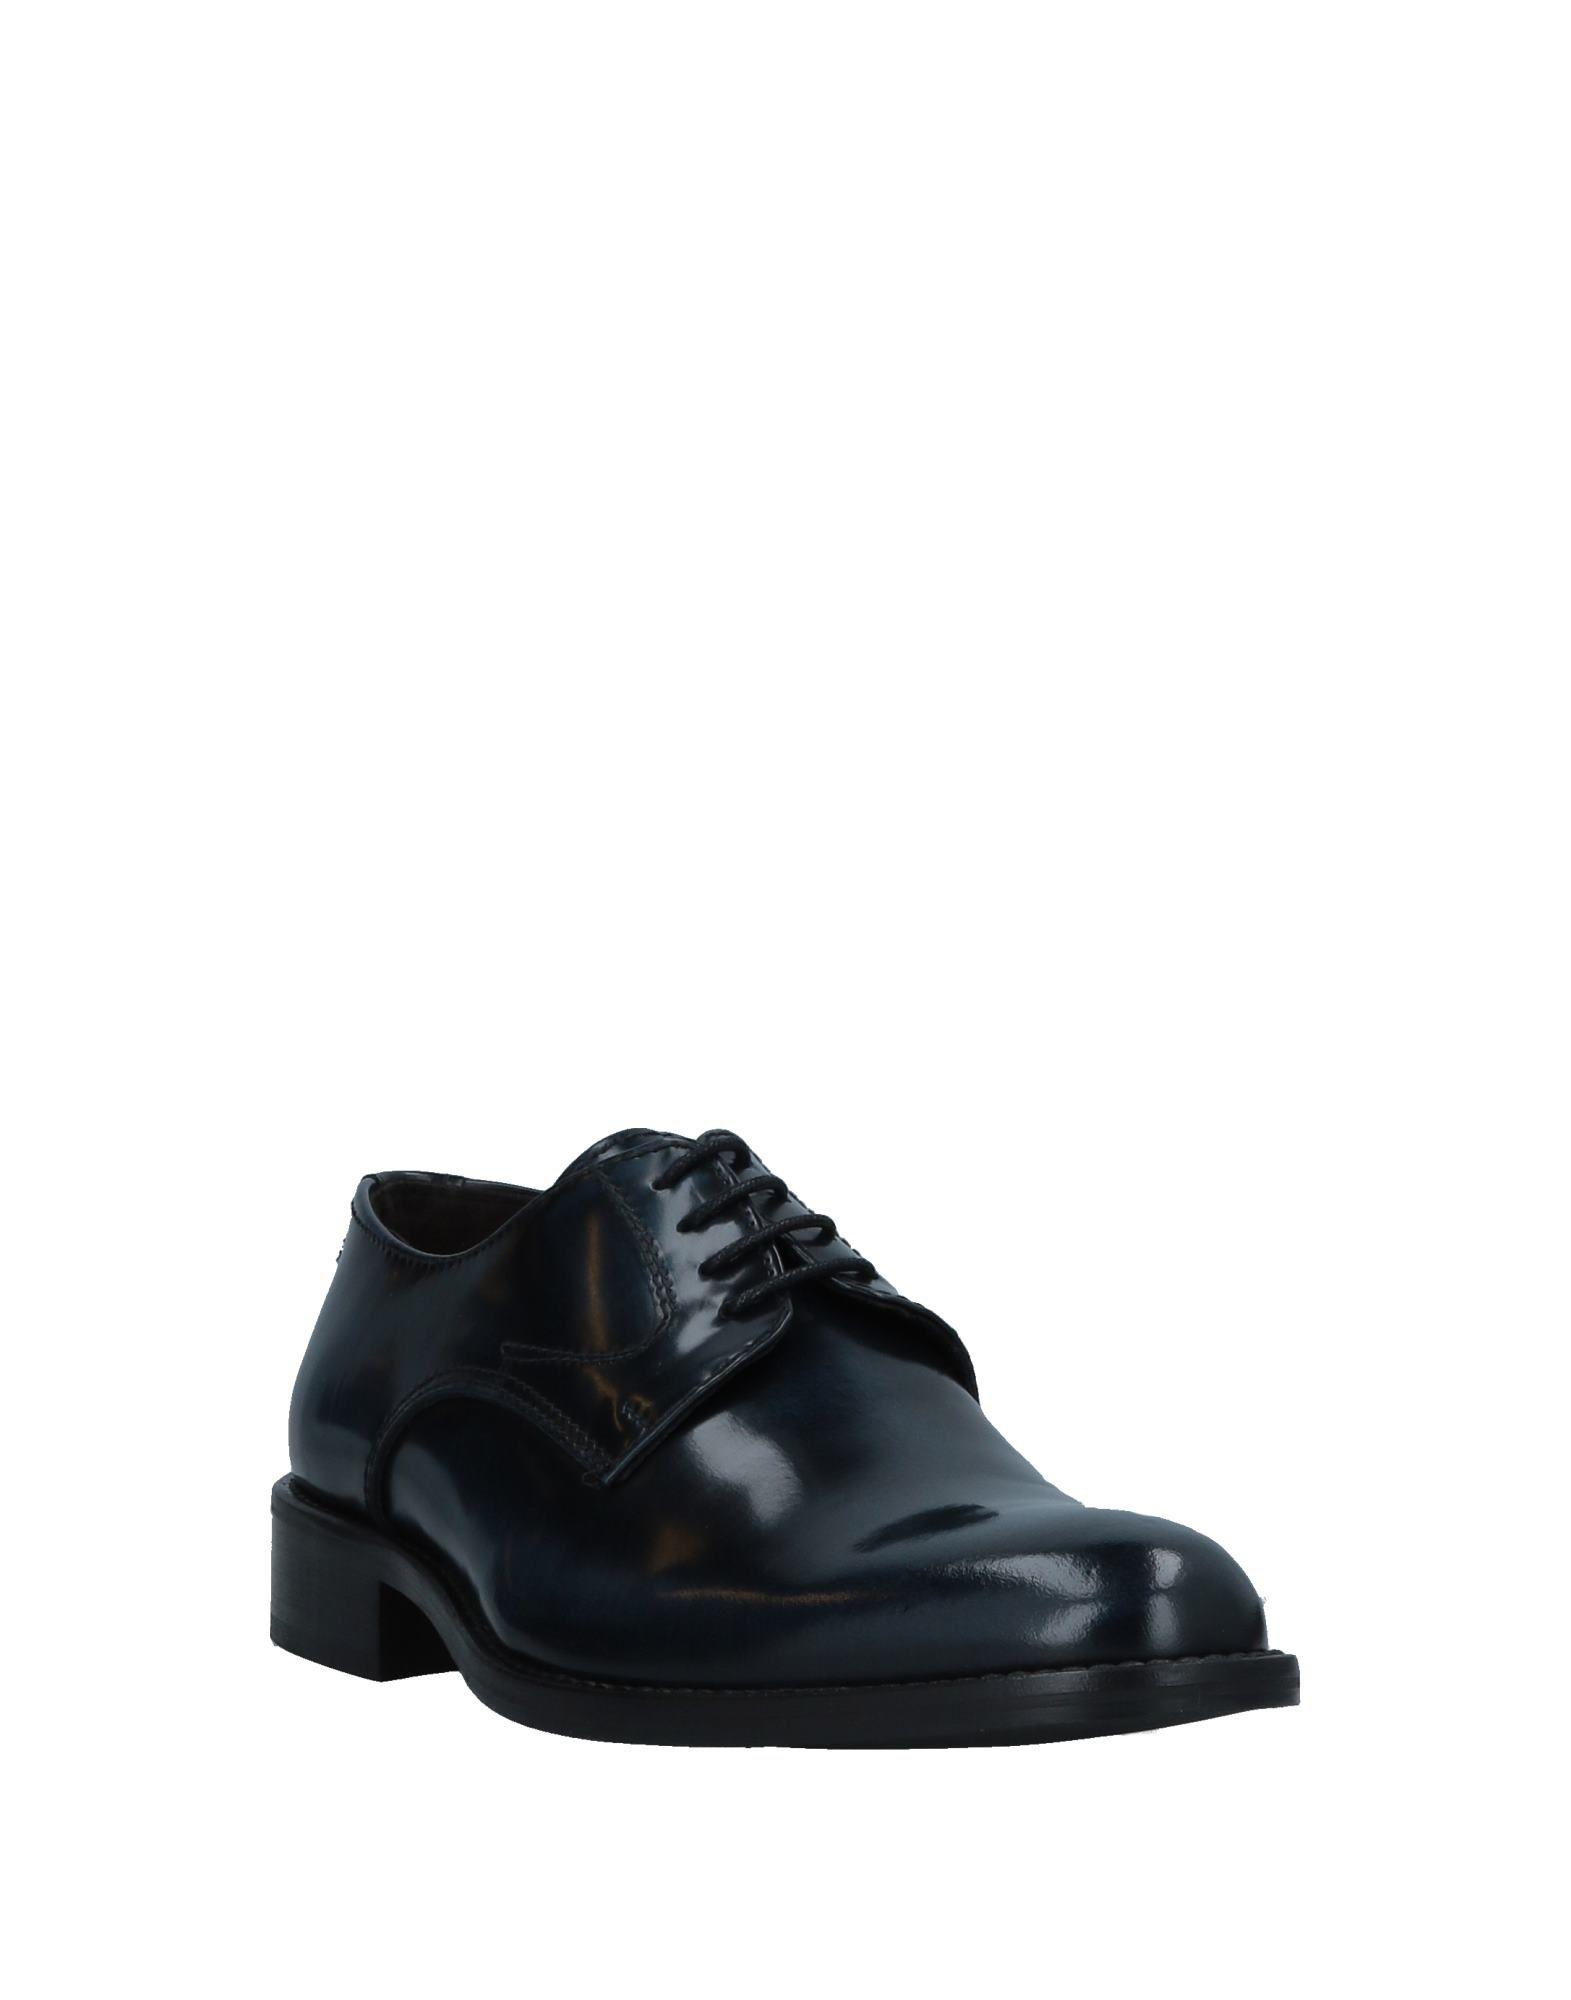 Rabatt echte Schuhe Brawn's Schnürschuhe Herren  11530223OM